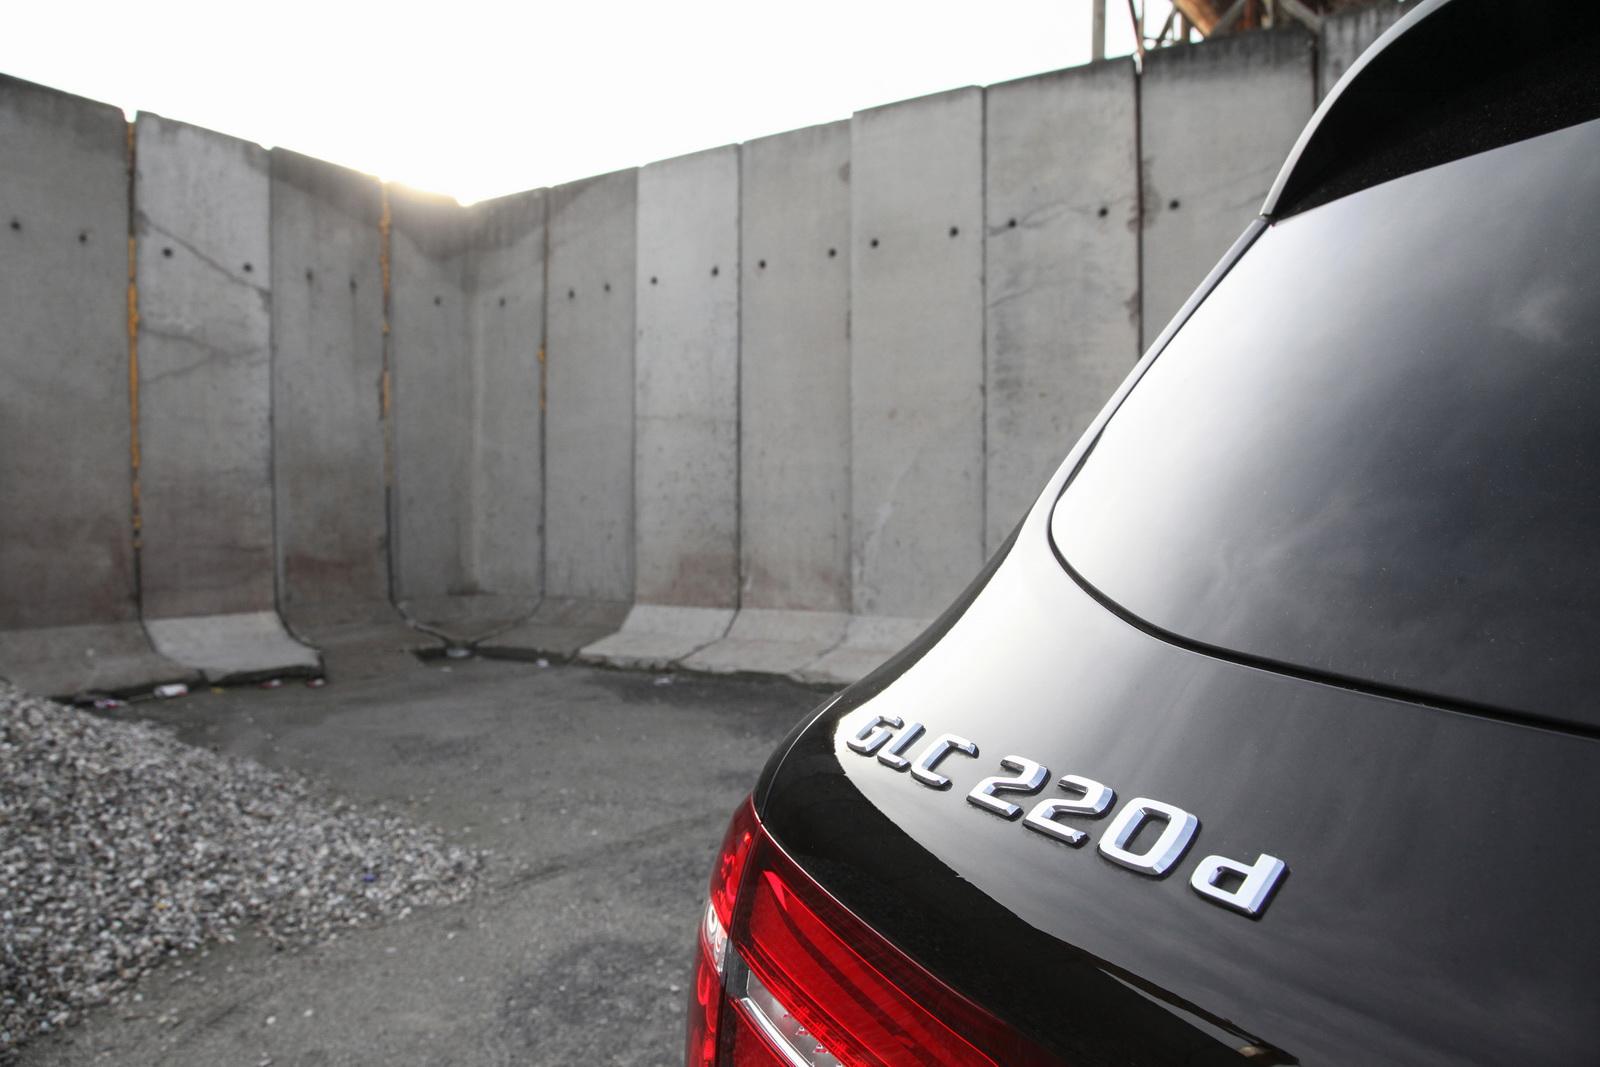 Mercedes_GLC220d_by_Vath_08